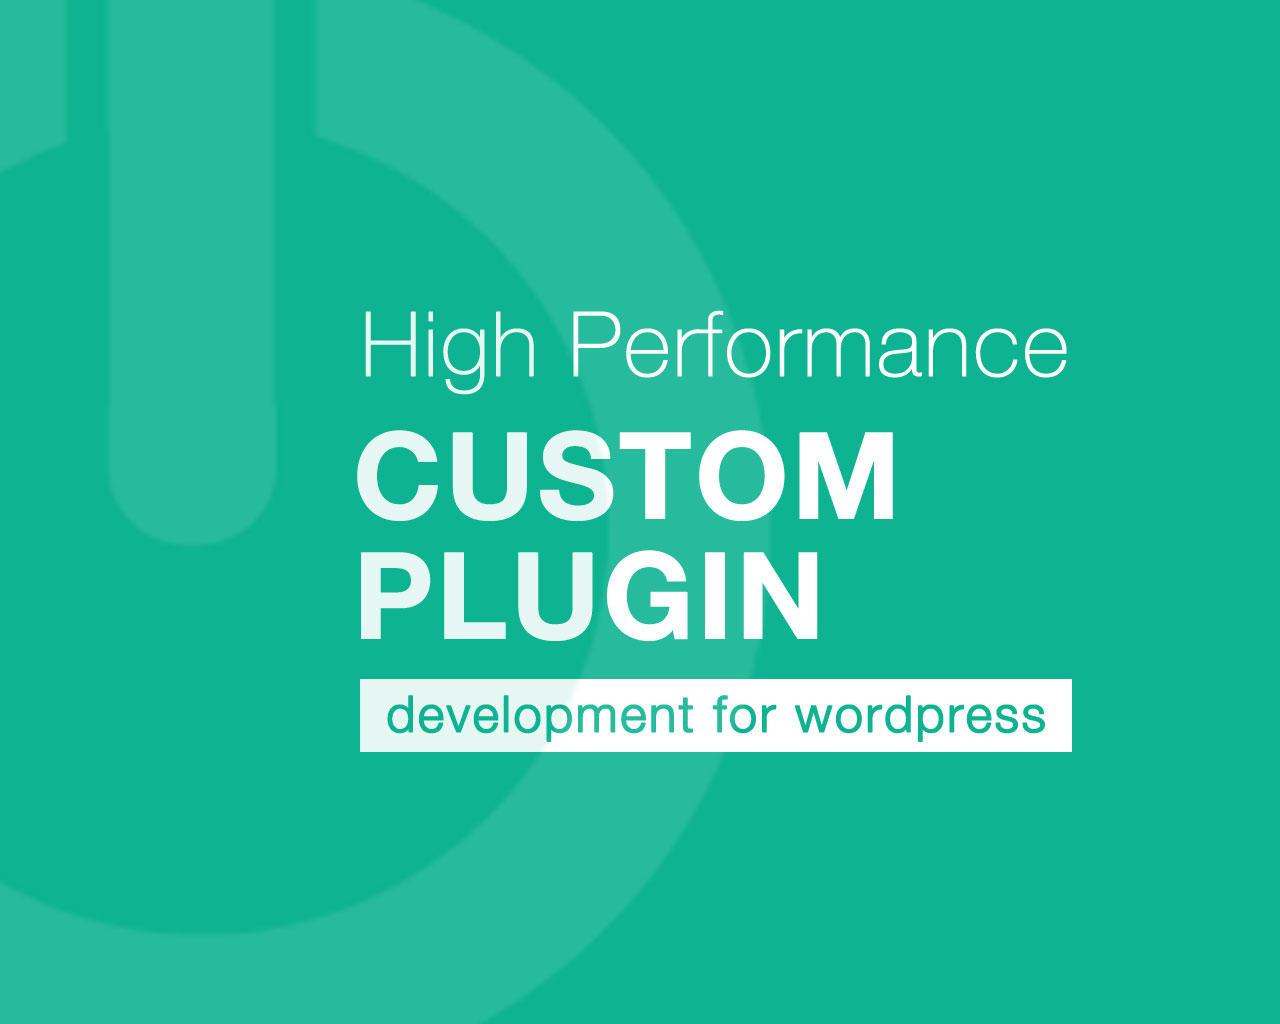 custom plugins development for wordpress by theemon on